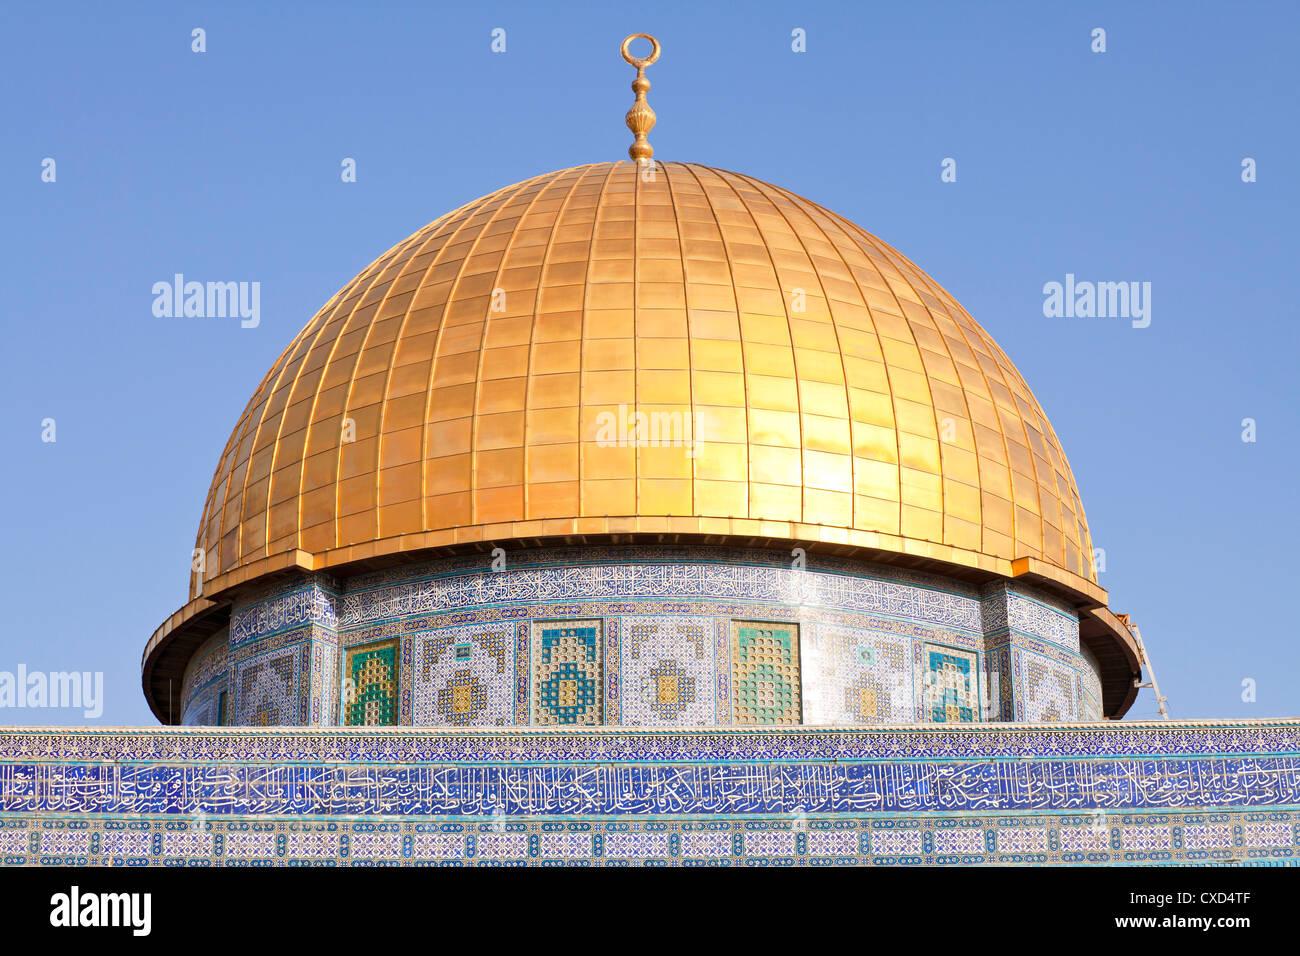 Kuppel des Rock, Tempelberg, Altstadt, UNESCO-Weltkulturerbe, Jerusalem, Israel, Nahost Stockbild